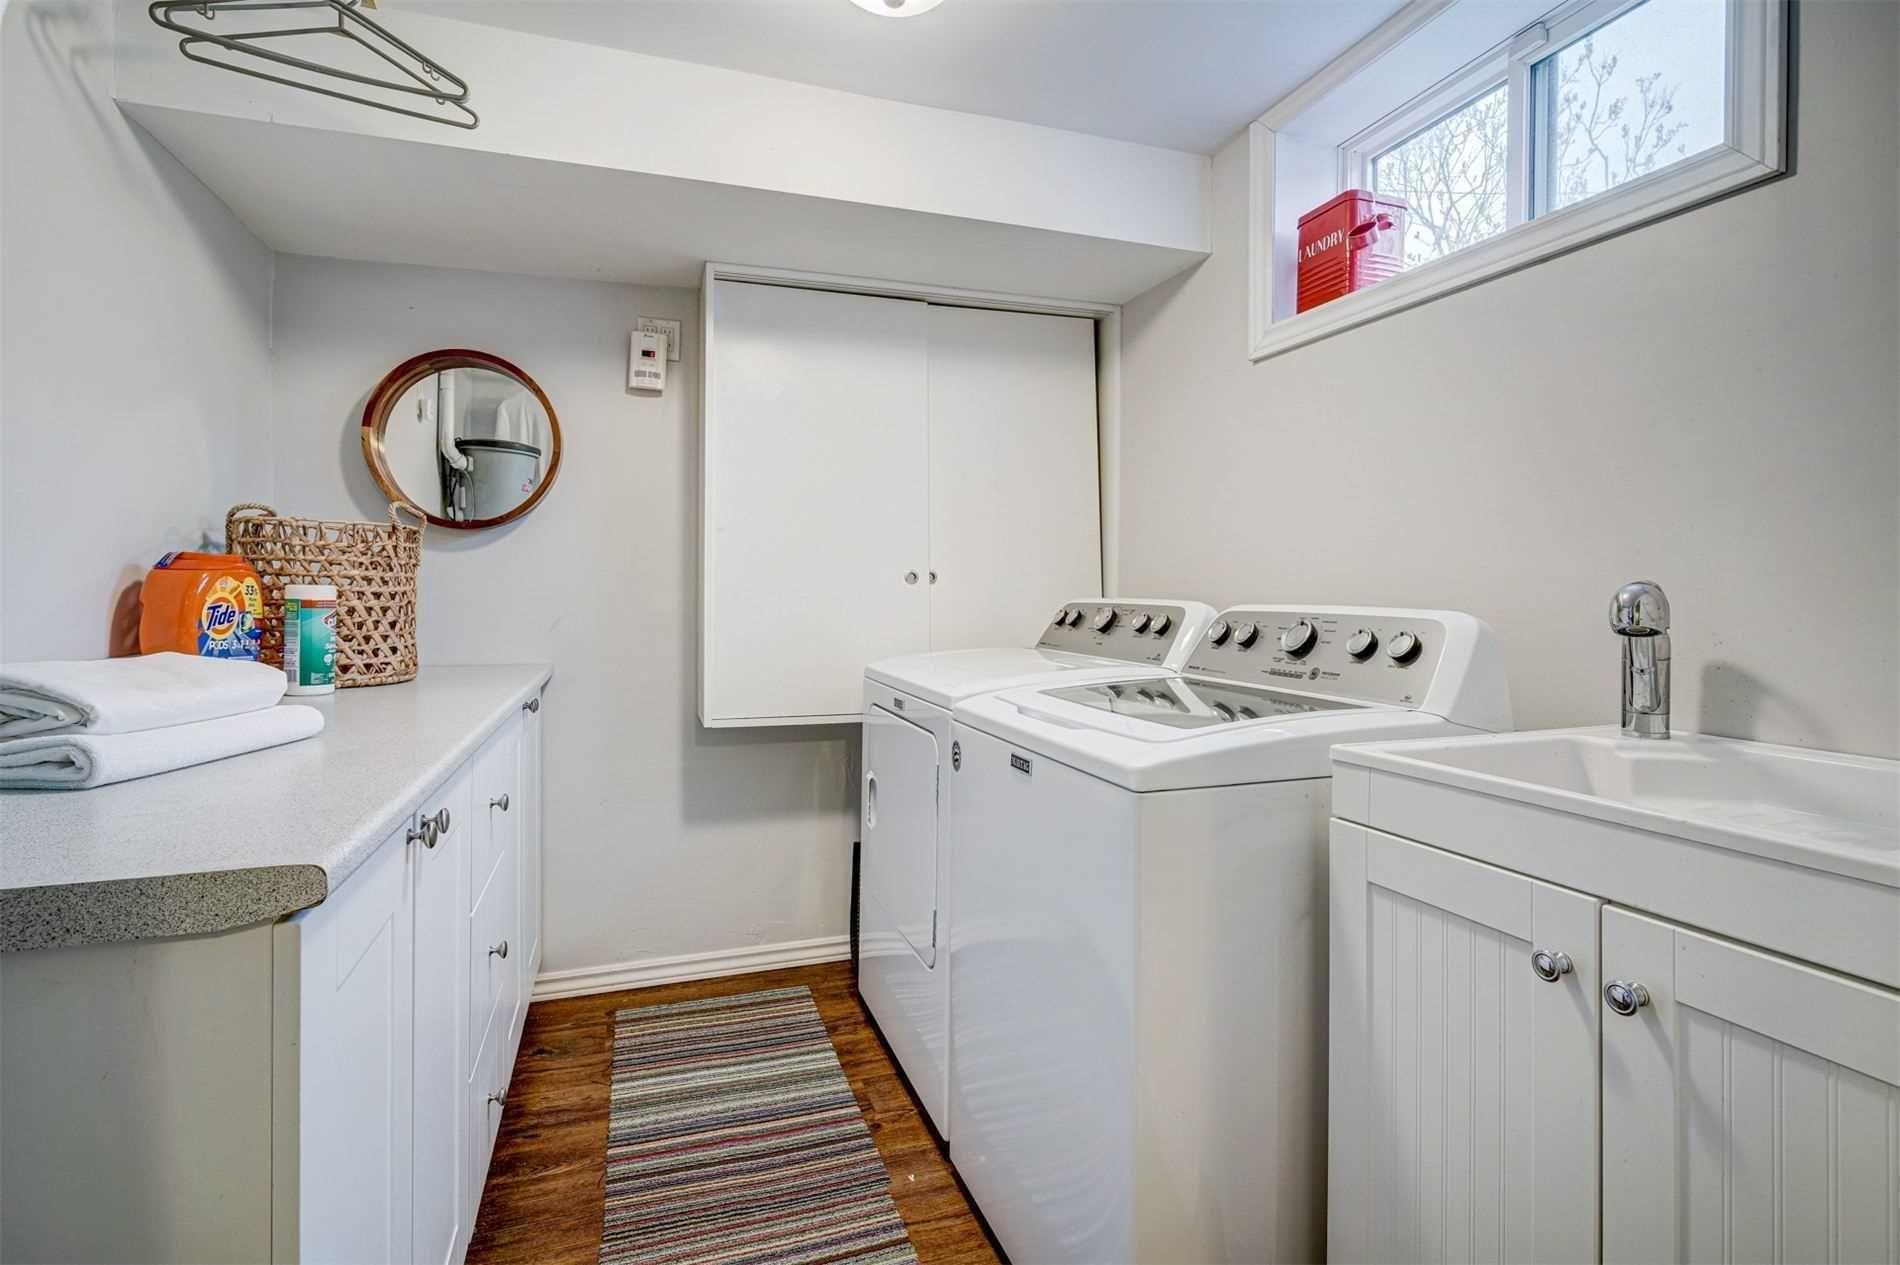 Photo 30: Photos: 92 Holborne Avenue in Toronto: Danforth Village-East York House (2-Storey) for sale (Toronto E03)  : MLS®# E5204452